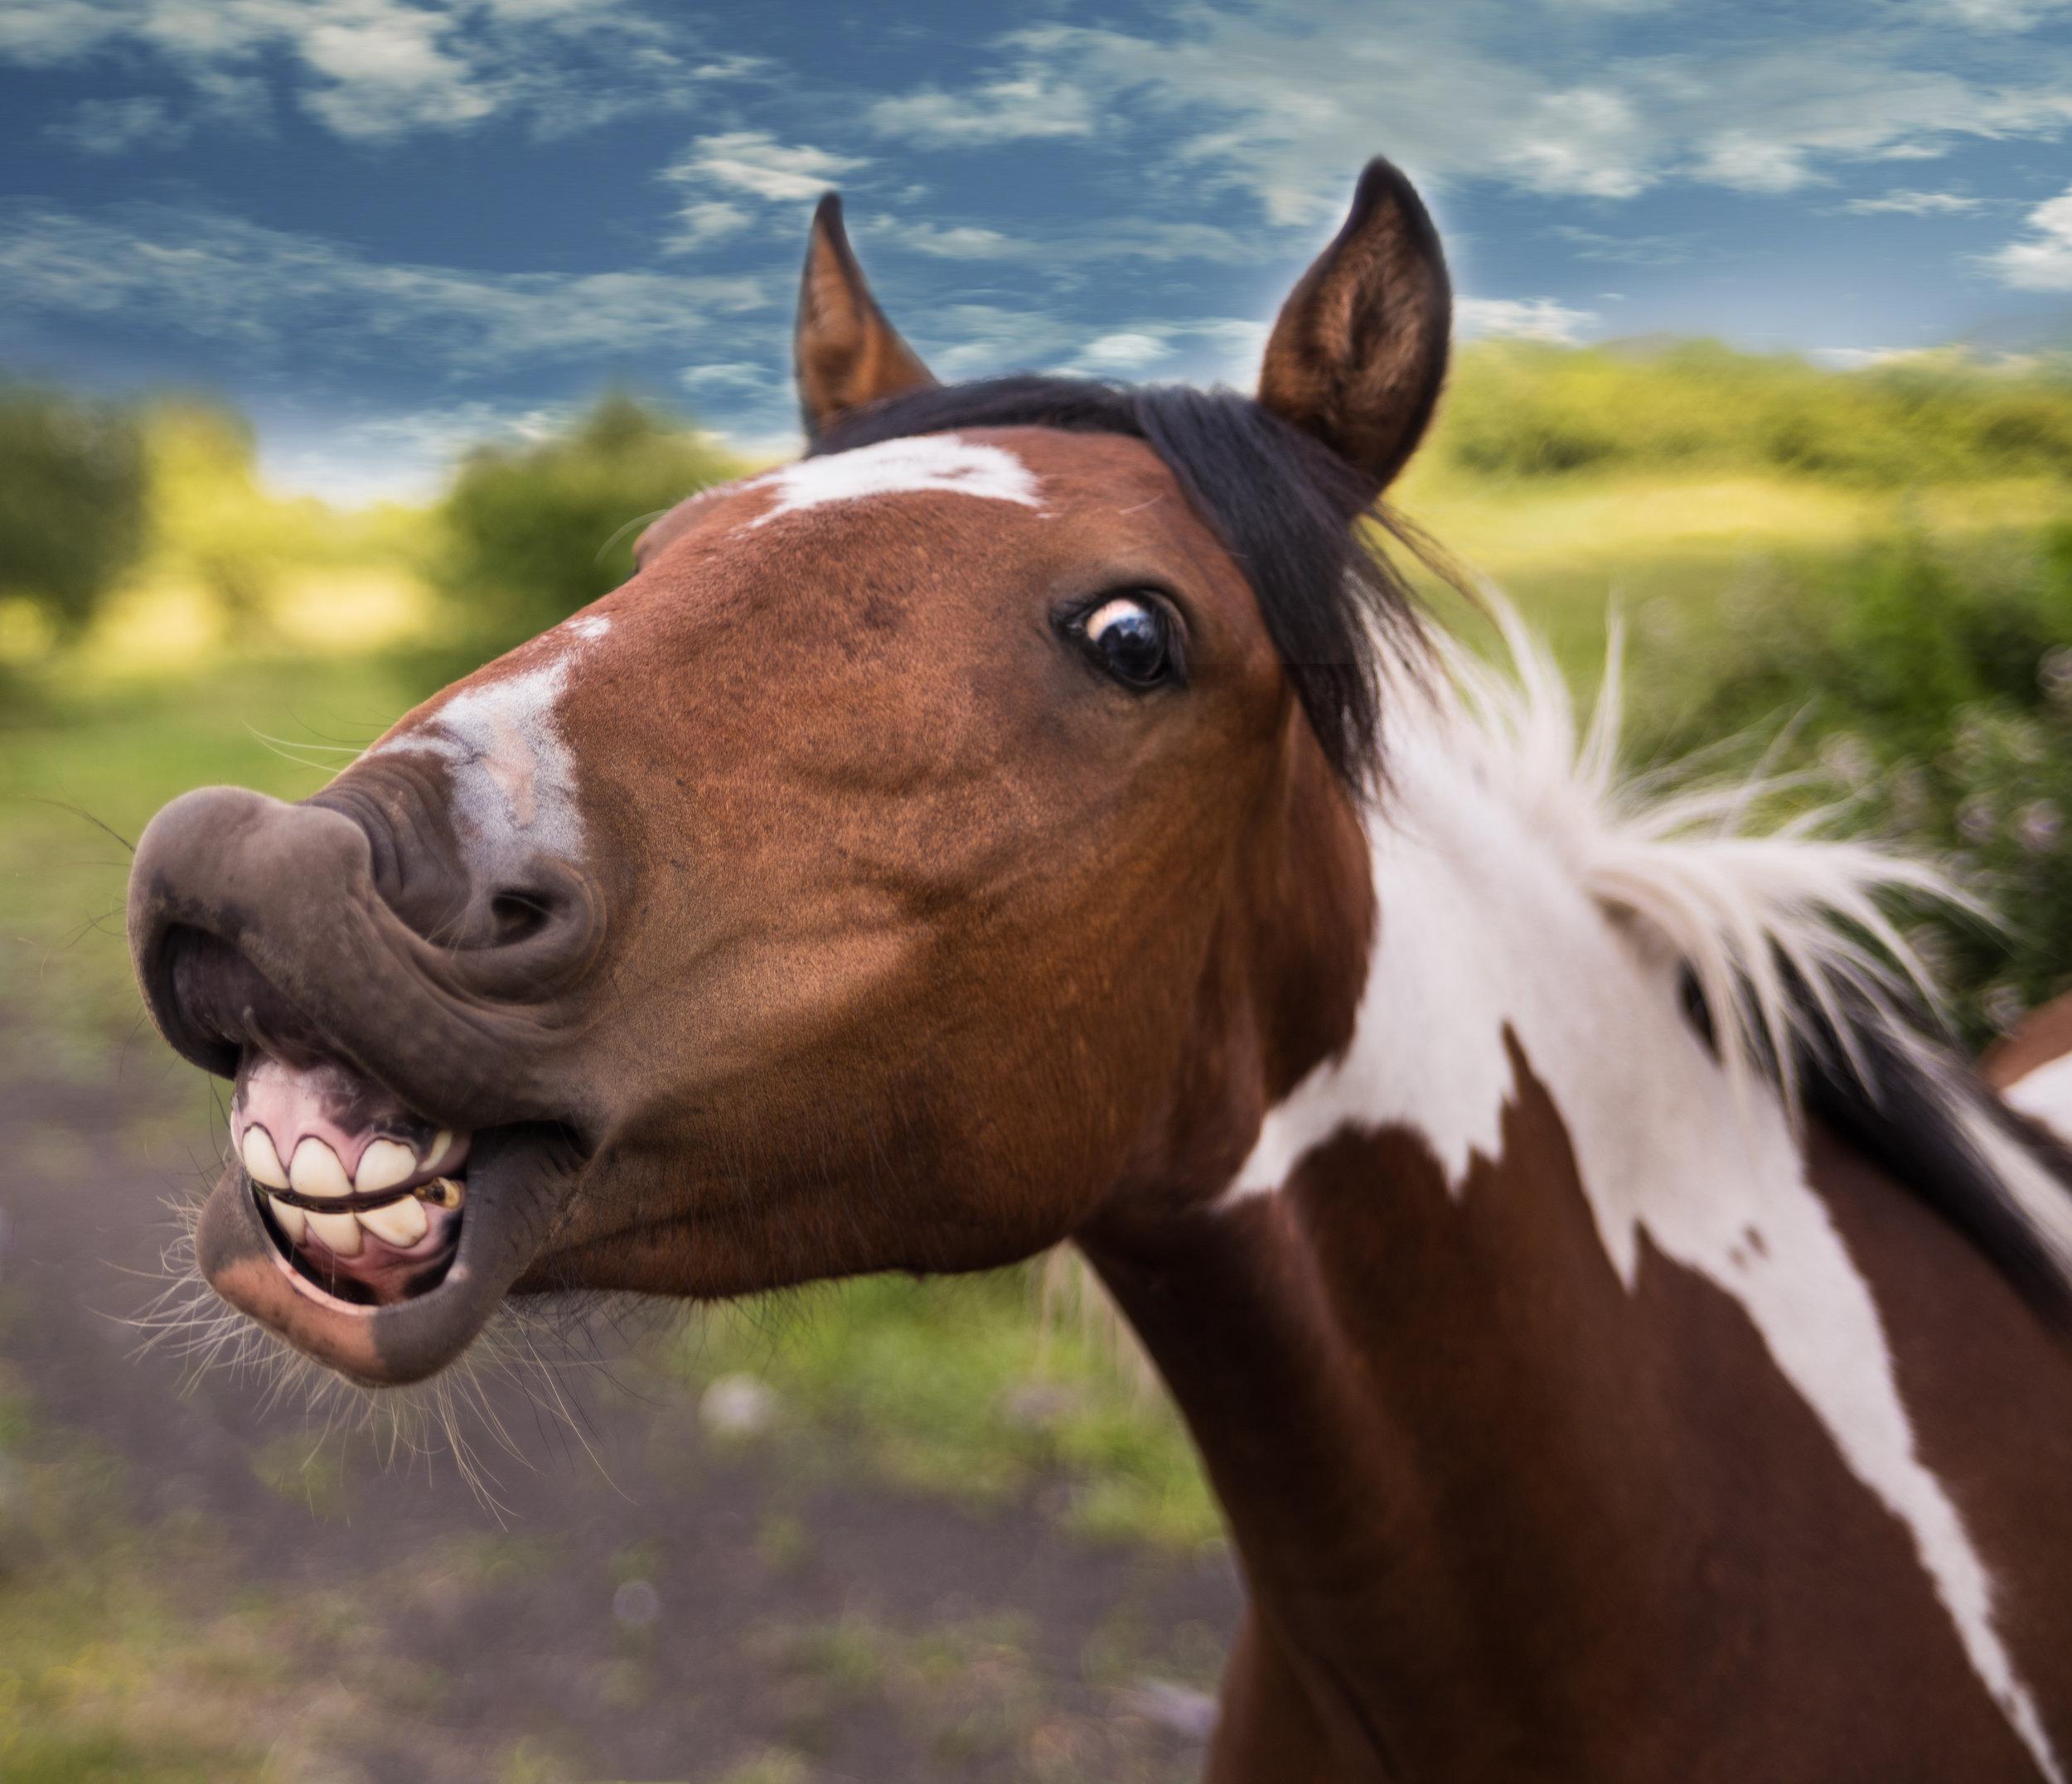 Horse performing Flehmen response